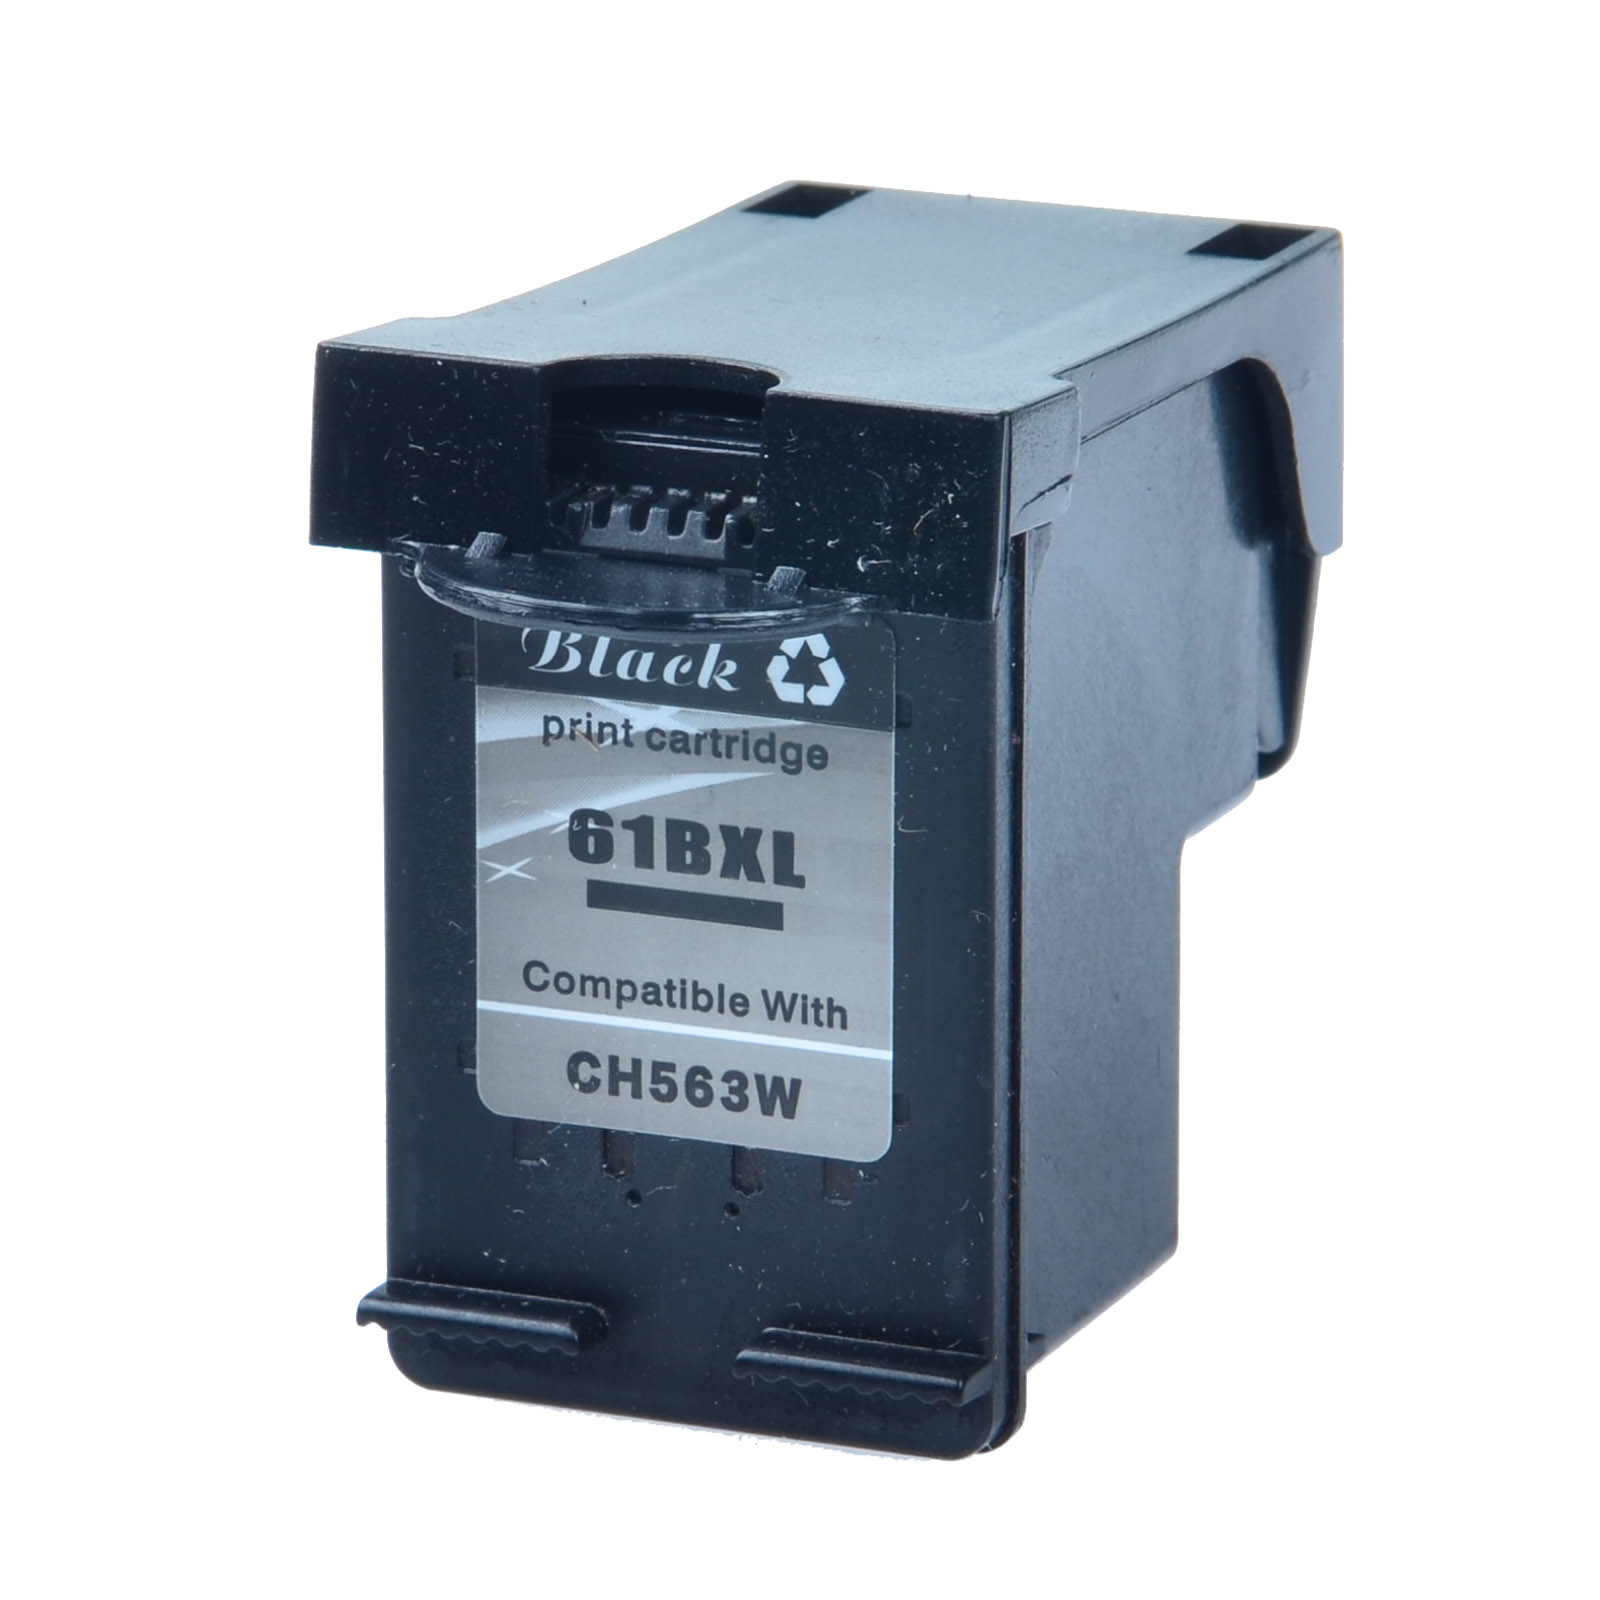 1000 1010 details about 1pk 61xl black ink cartridge remanufactured for hp ch563w  deskjet 1000 1010 1050